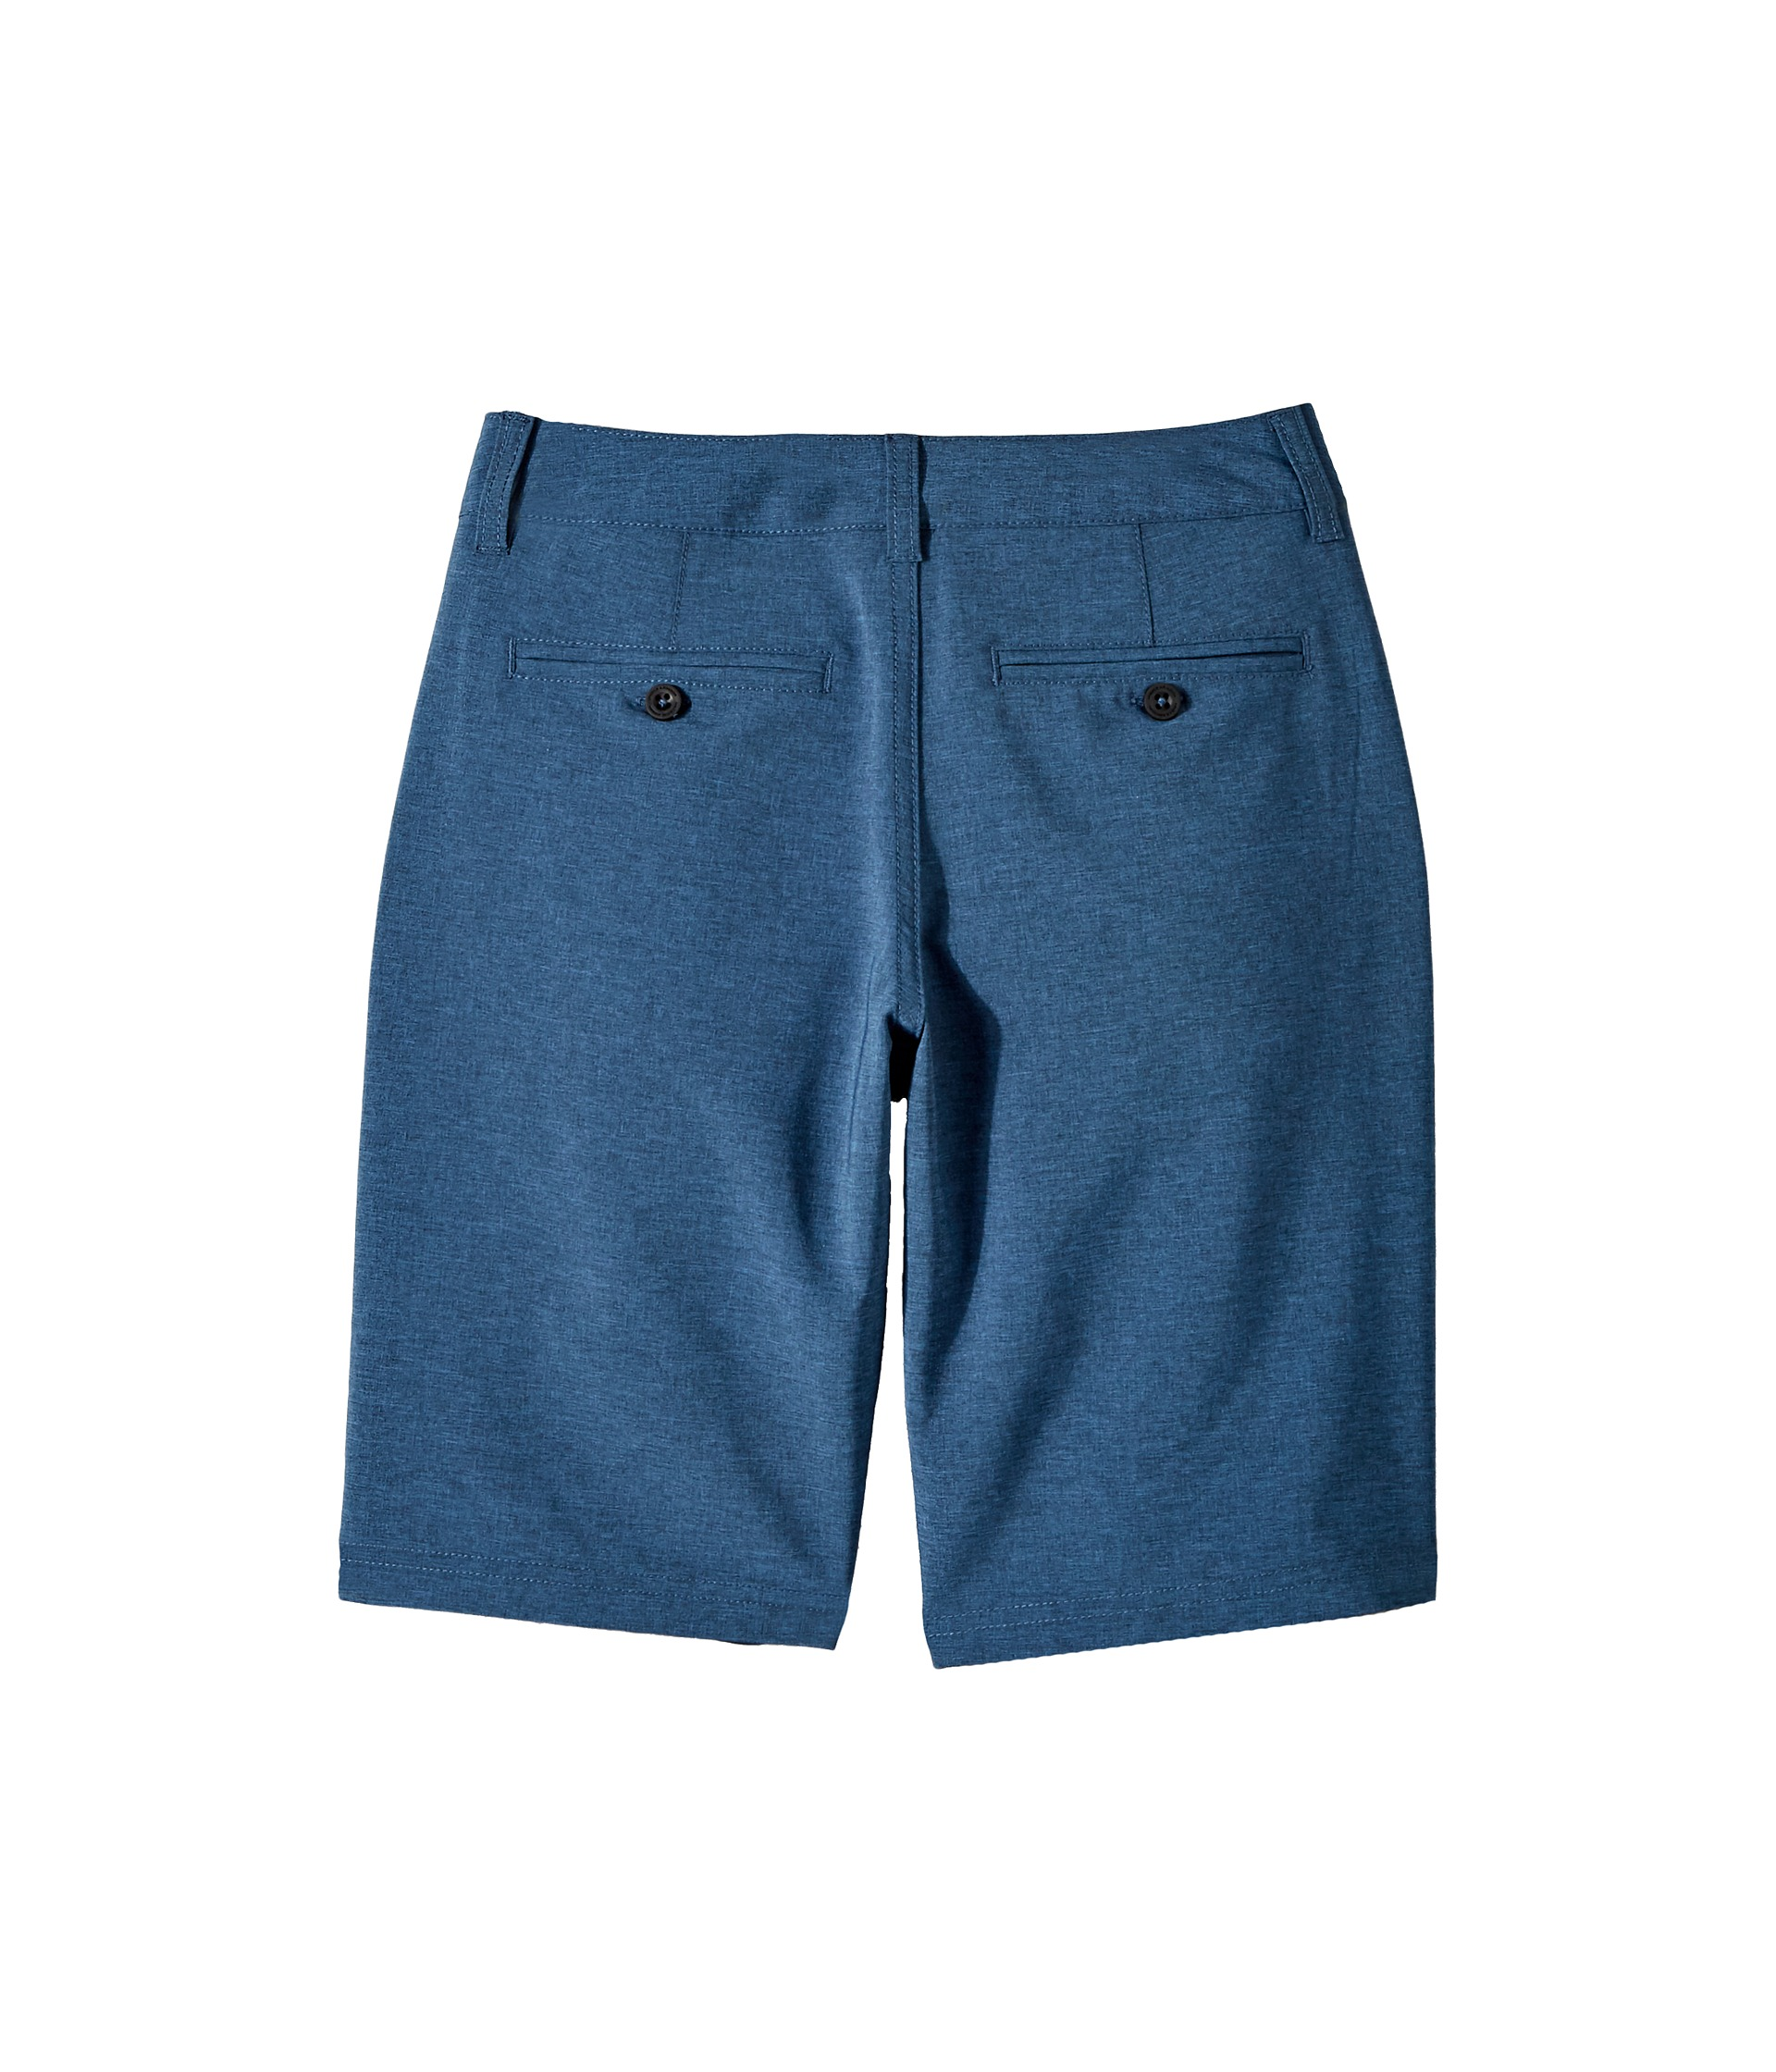 Under Armour Kids Striated Shorts Big Kids At